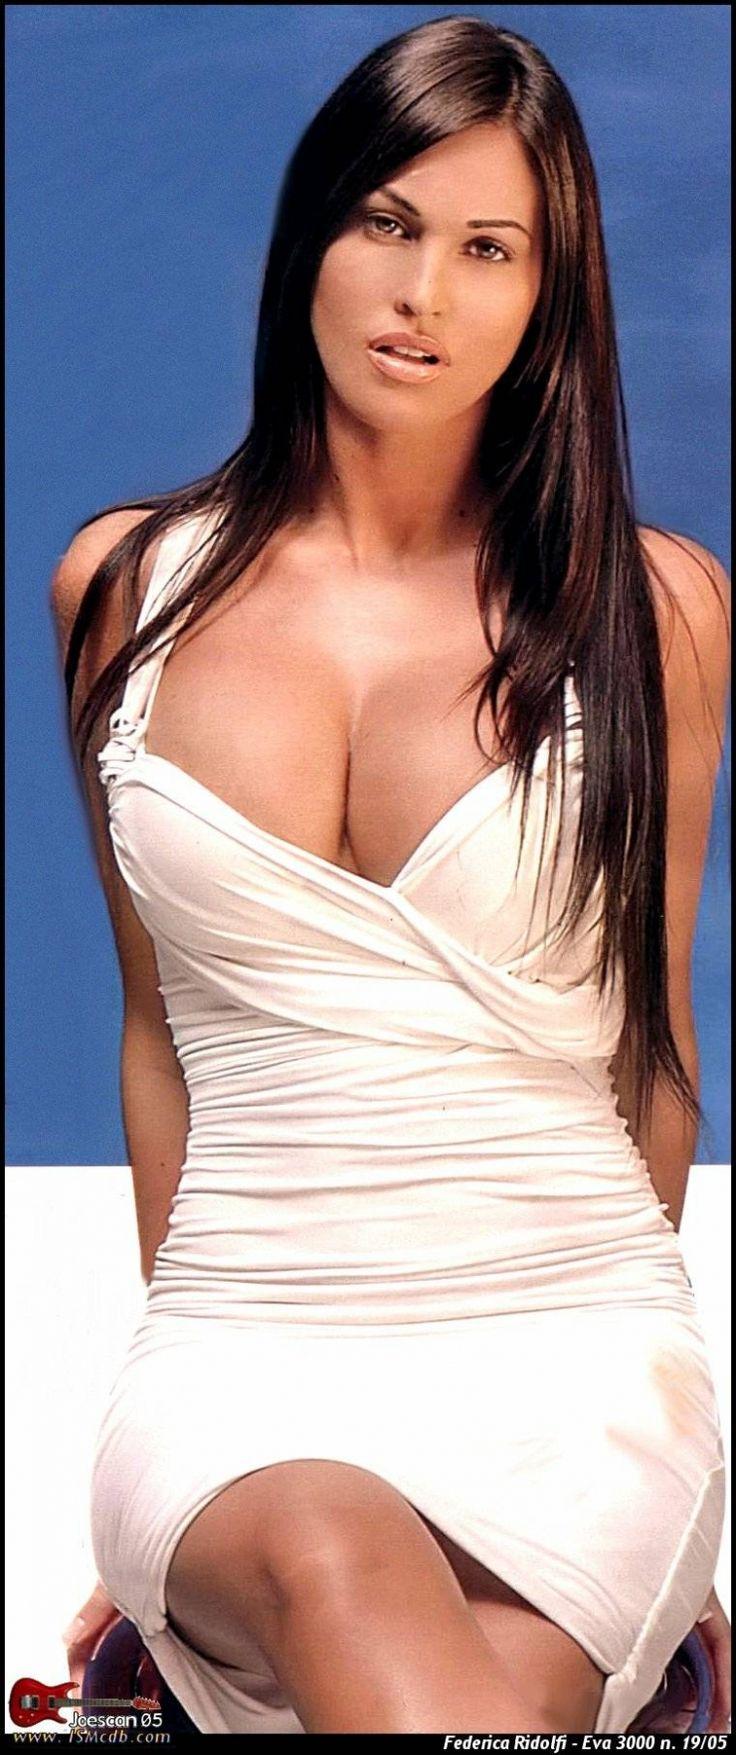 Italian Hotties Ideal 31 best donne italiane images on pinterest | actresses, beautiful